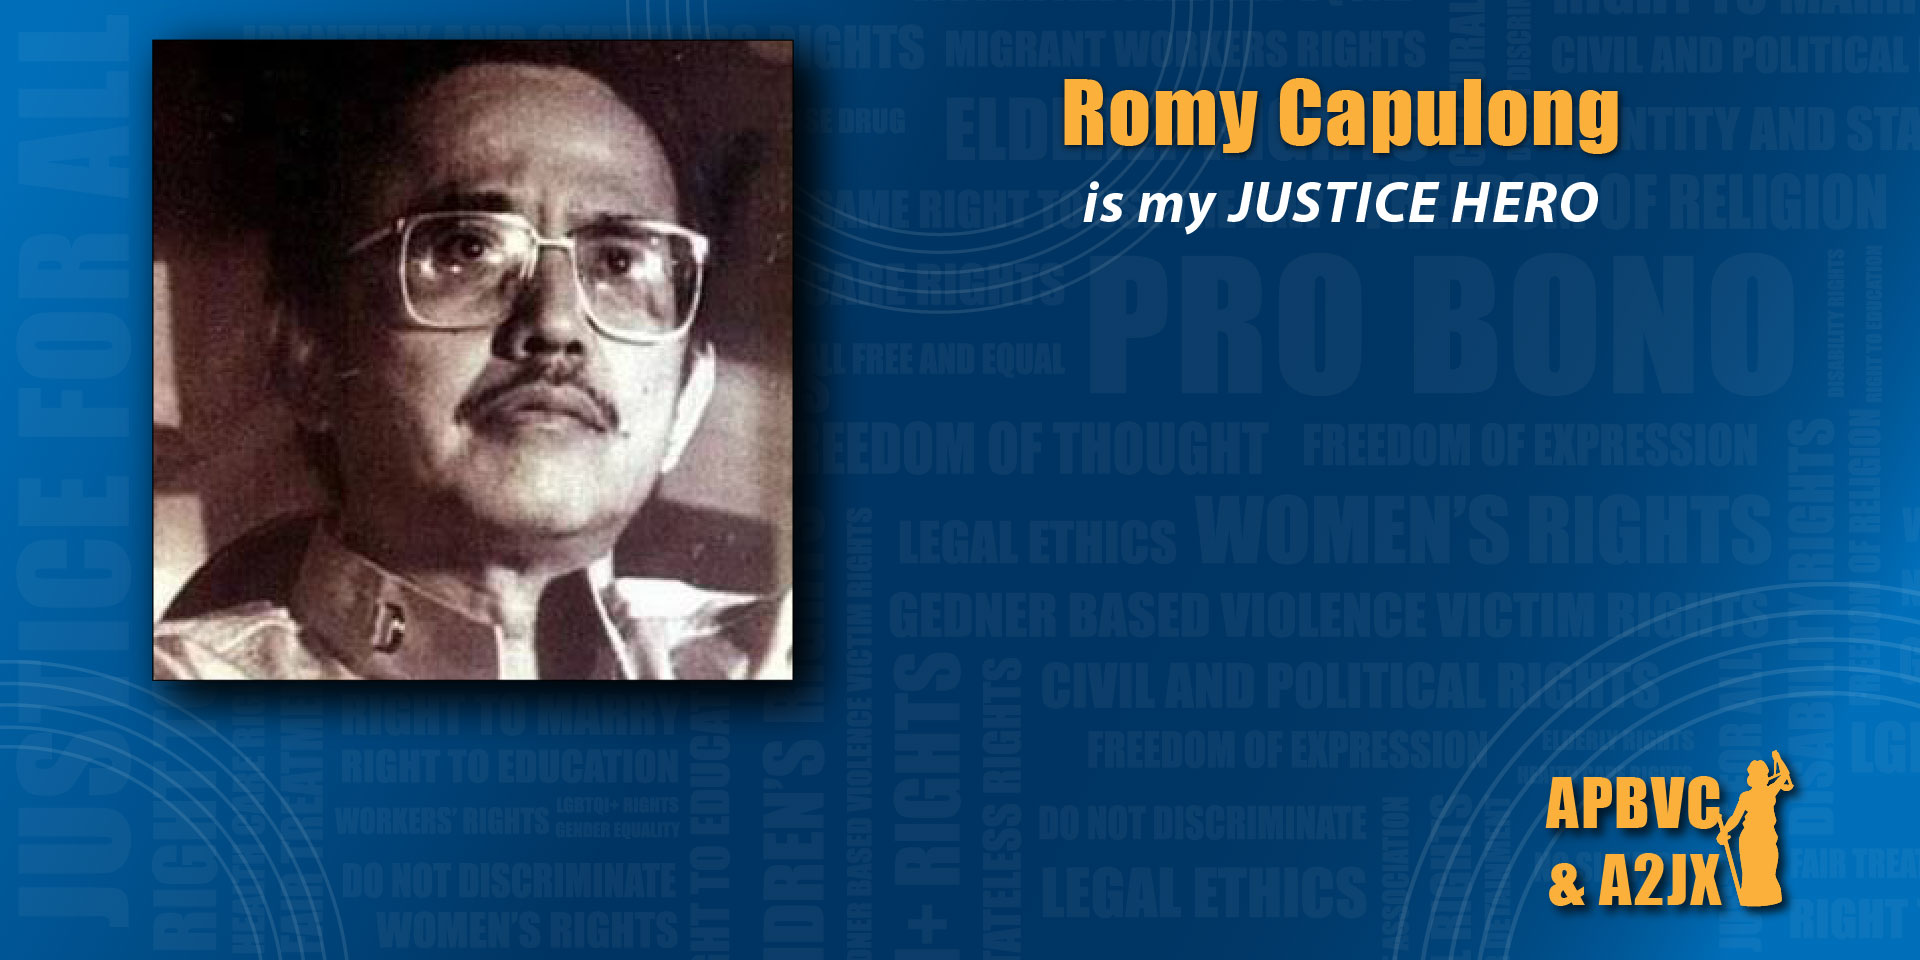 Romy Capulong